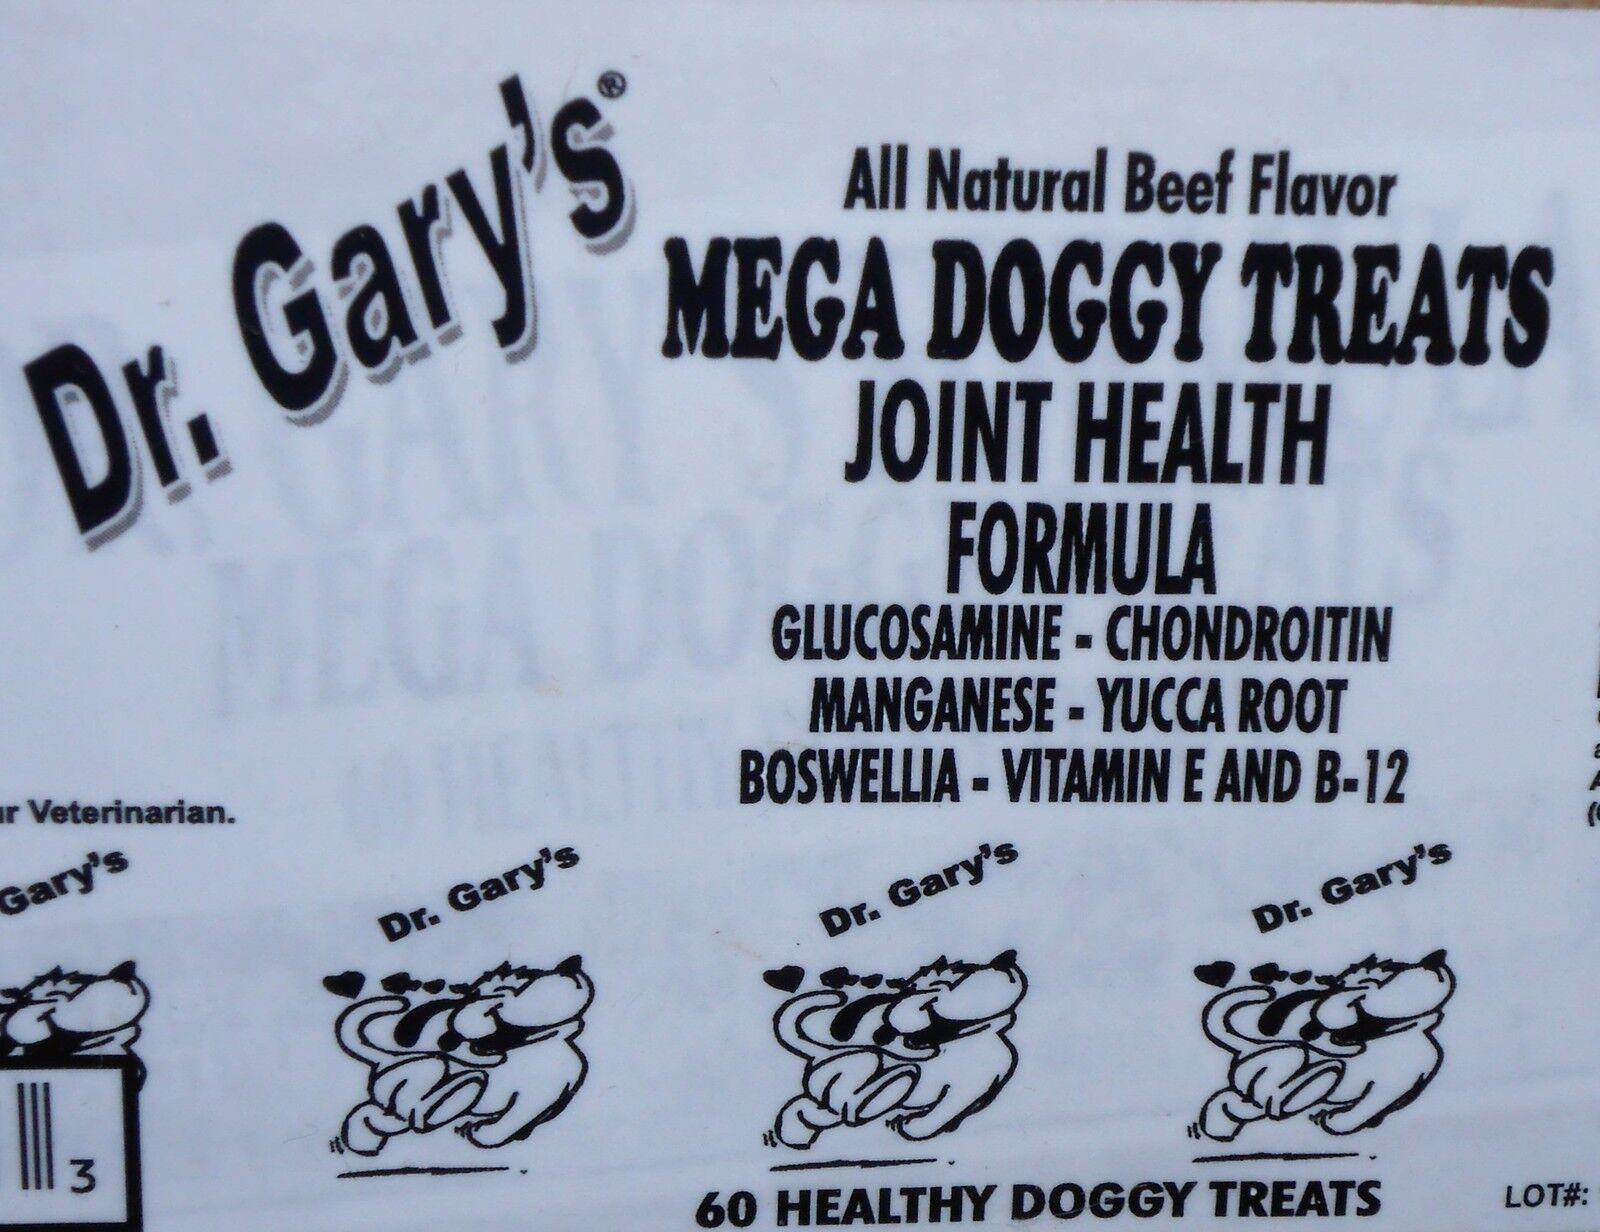 Dr Garys Dog Glucosamine Treat Caps